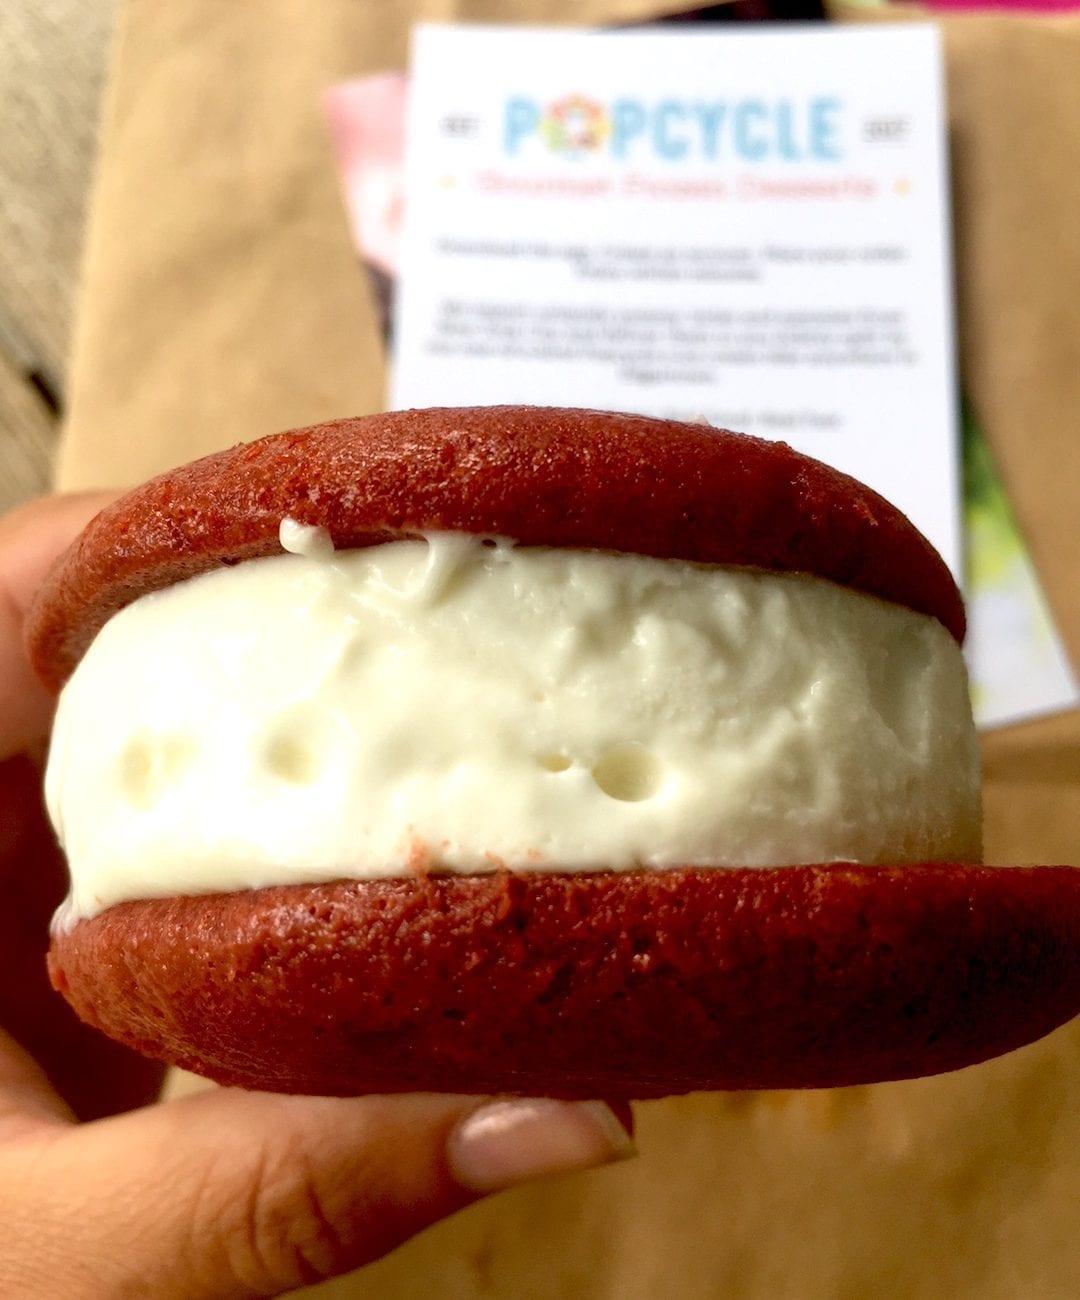 Melt Bakery Lovelet Martha's Vineyard Popcycle Frozen Desserts Delivered In Edgartown